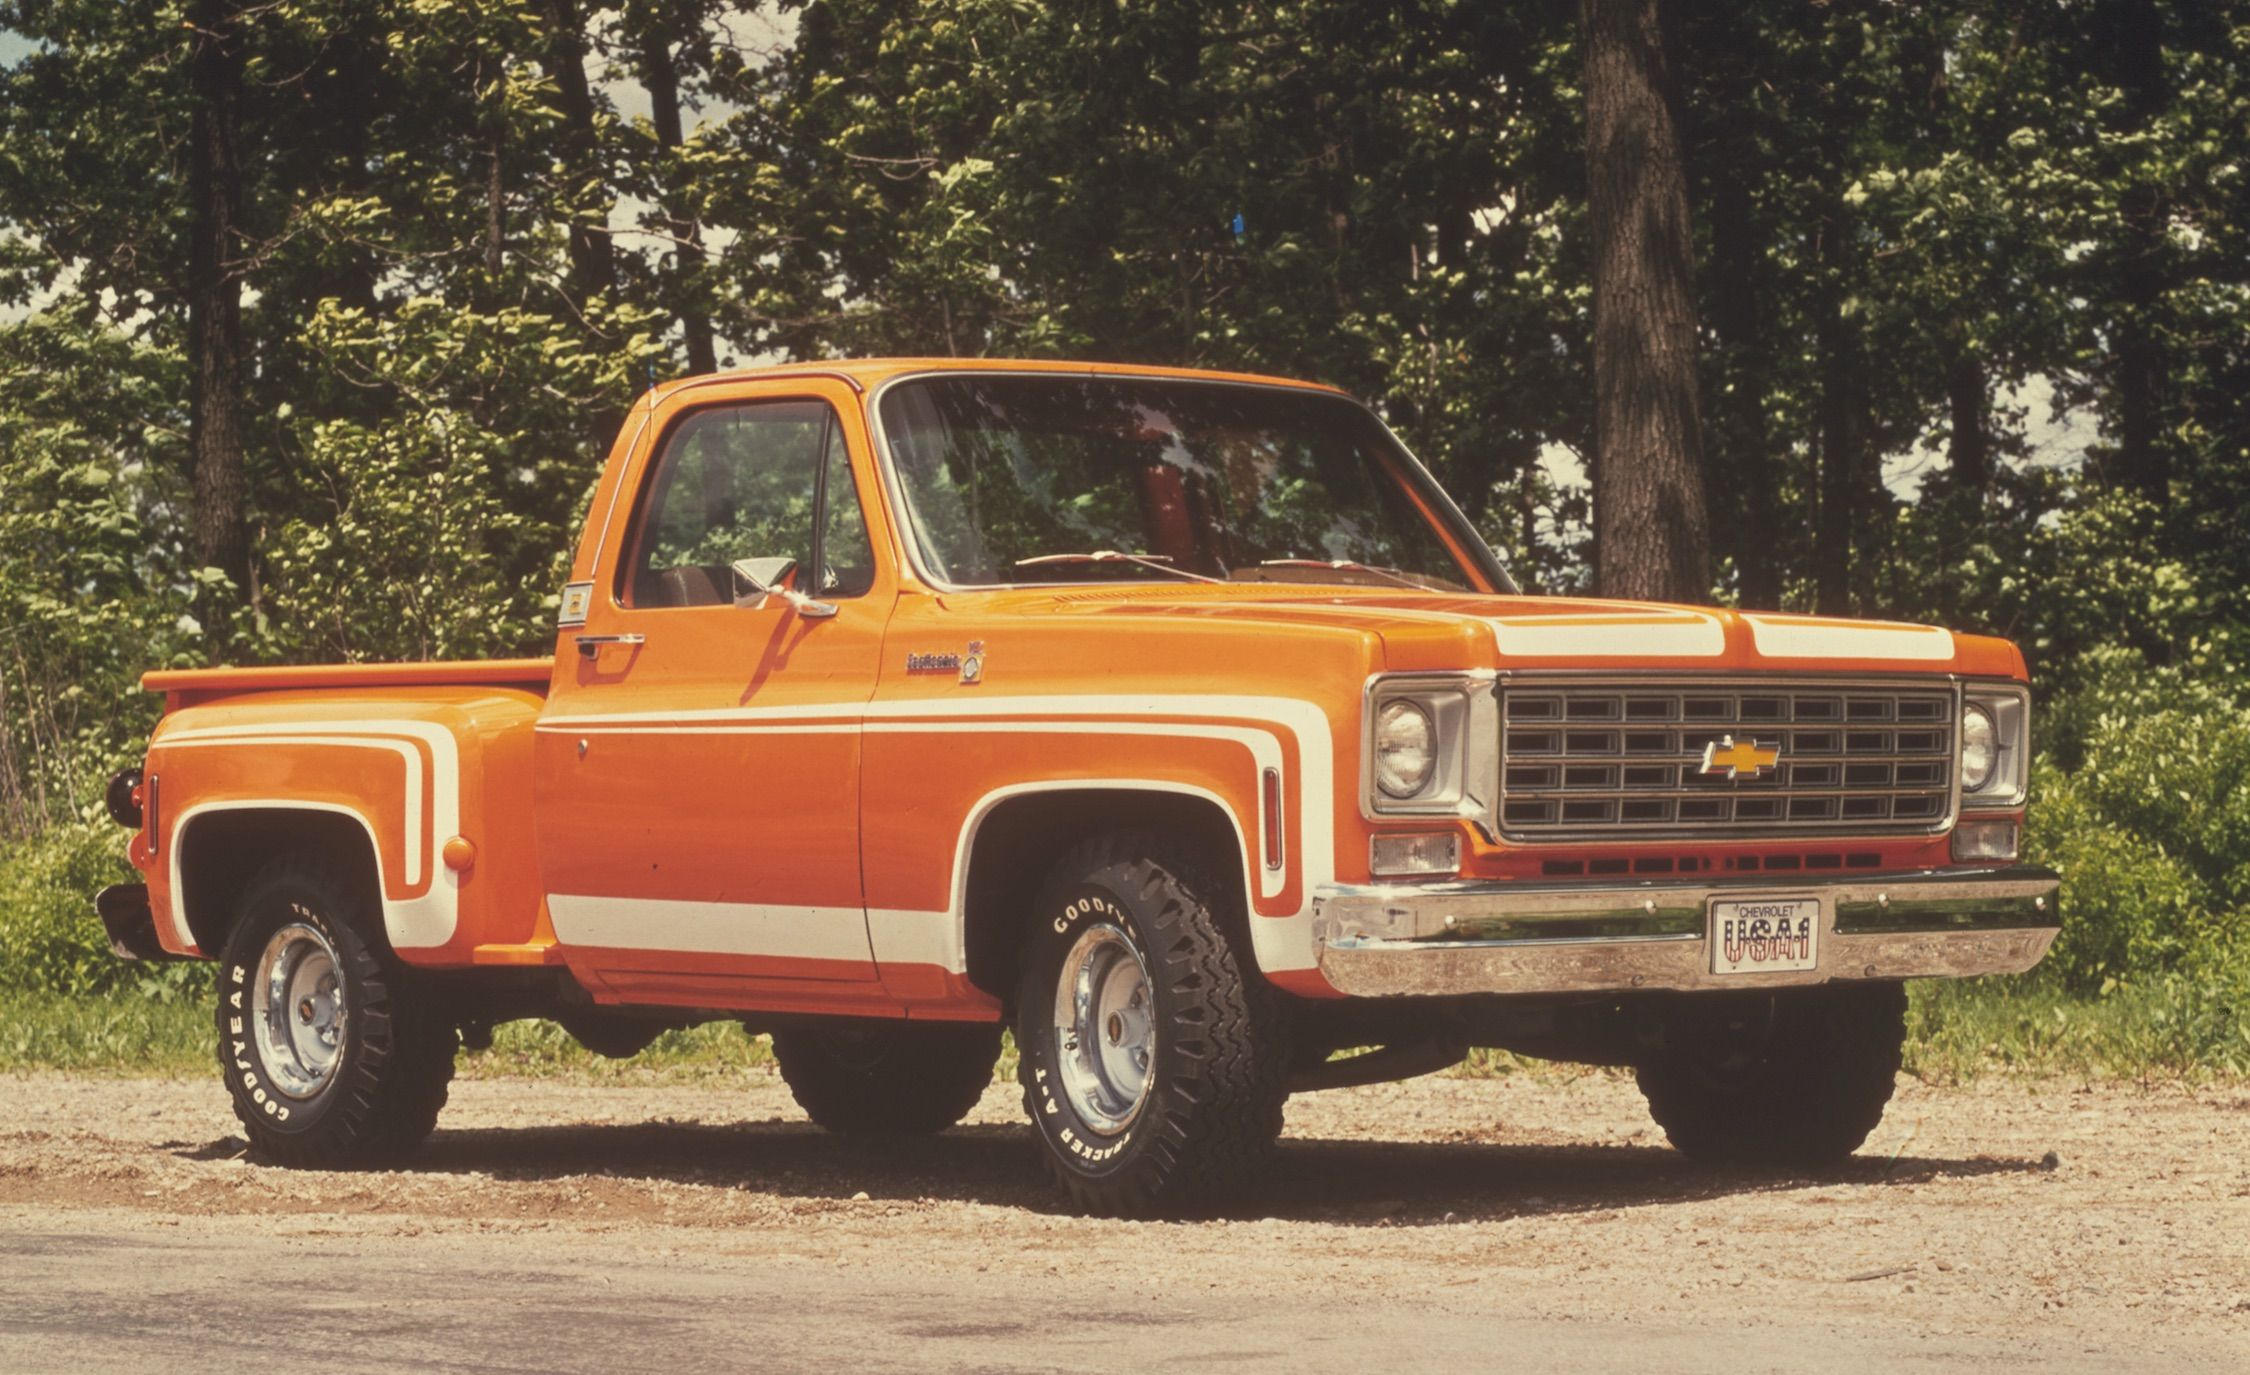 Mondo Macho Special Edition Trucks Of The 70s K Billys Super 1983 Chevy Silverado Crew Cab Badge And Stripe Jobs